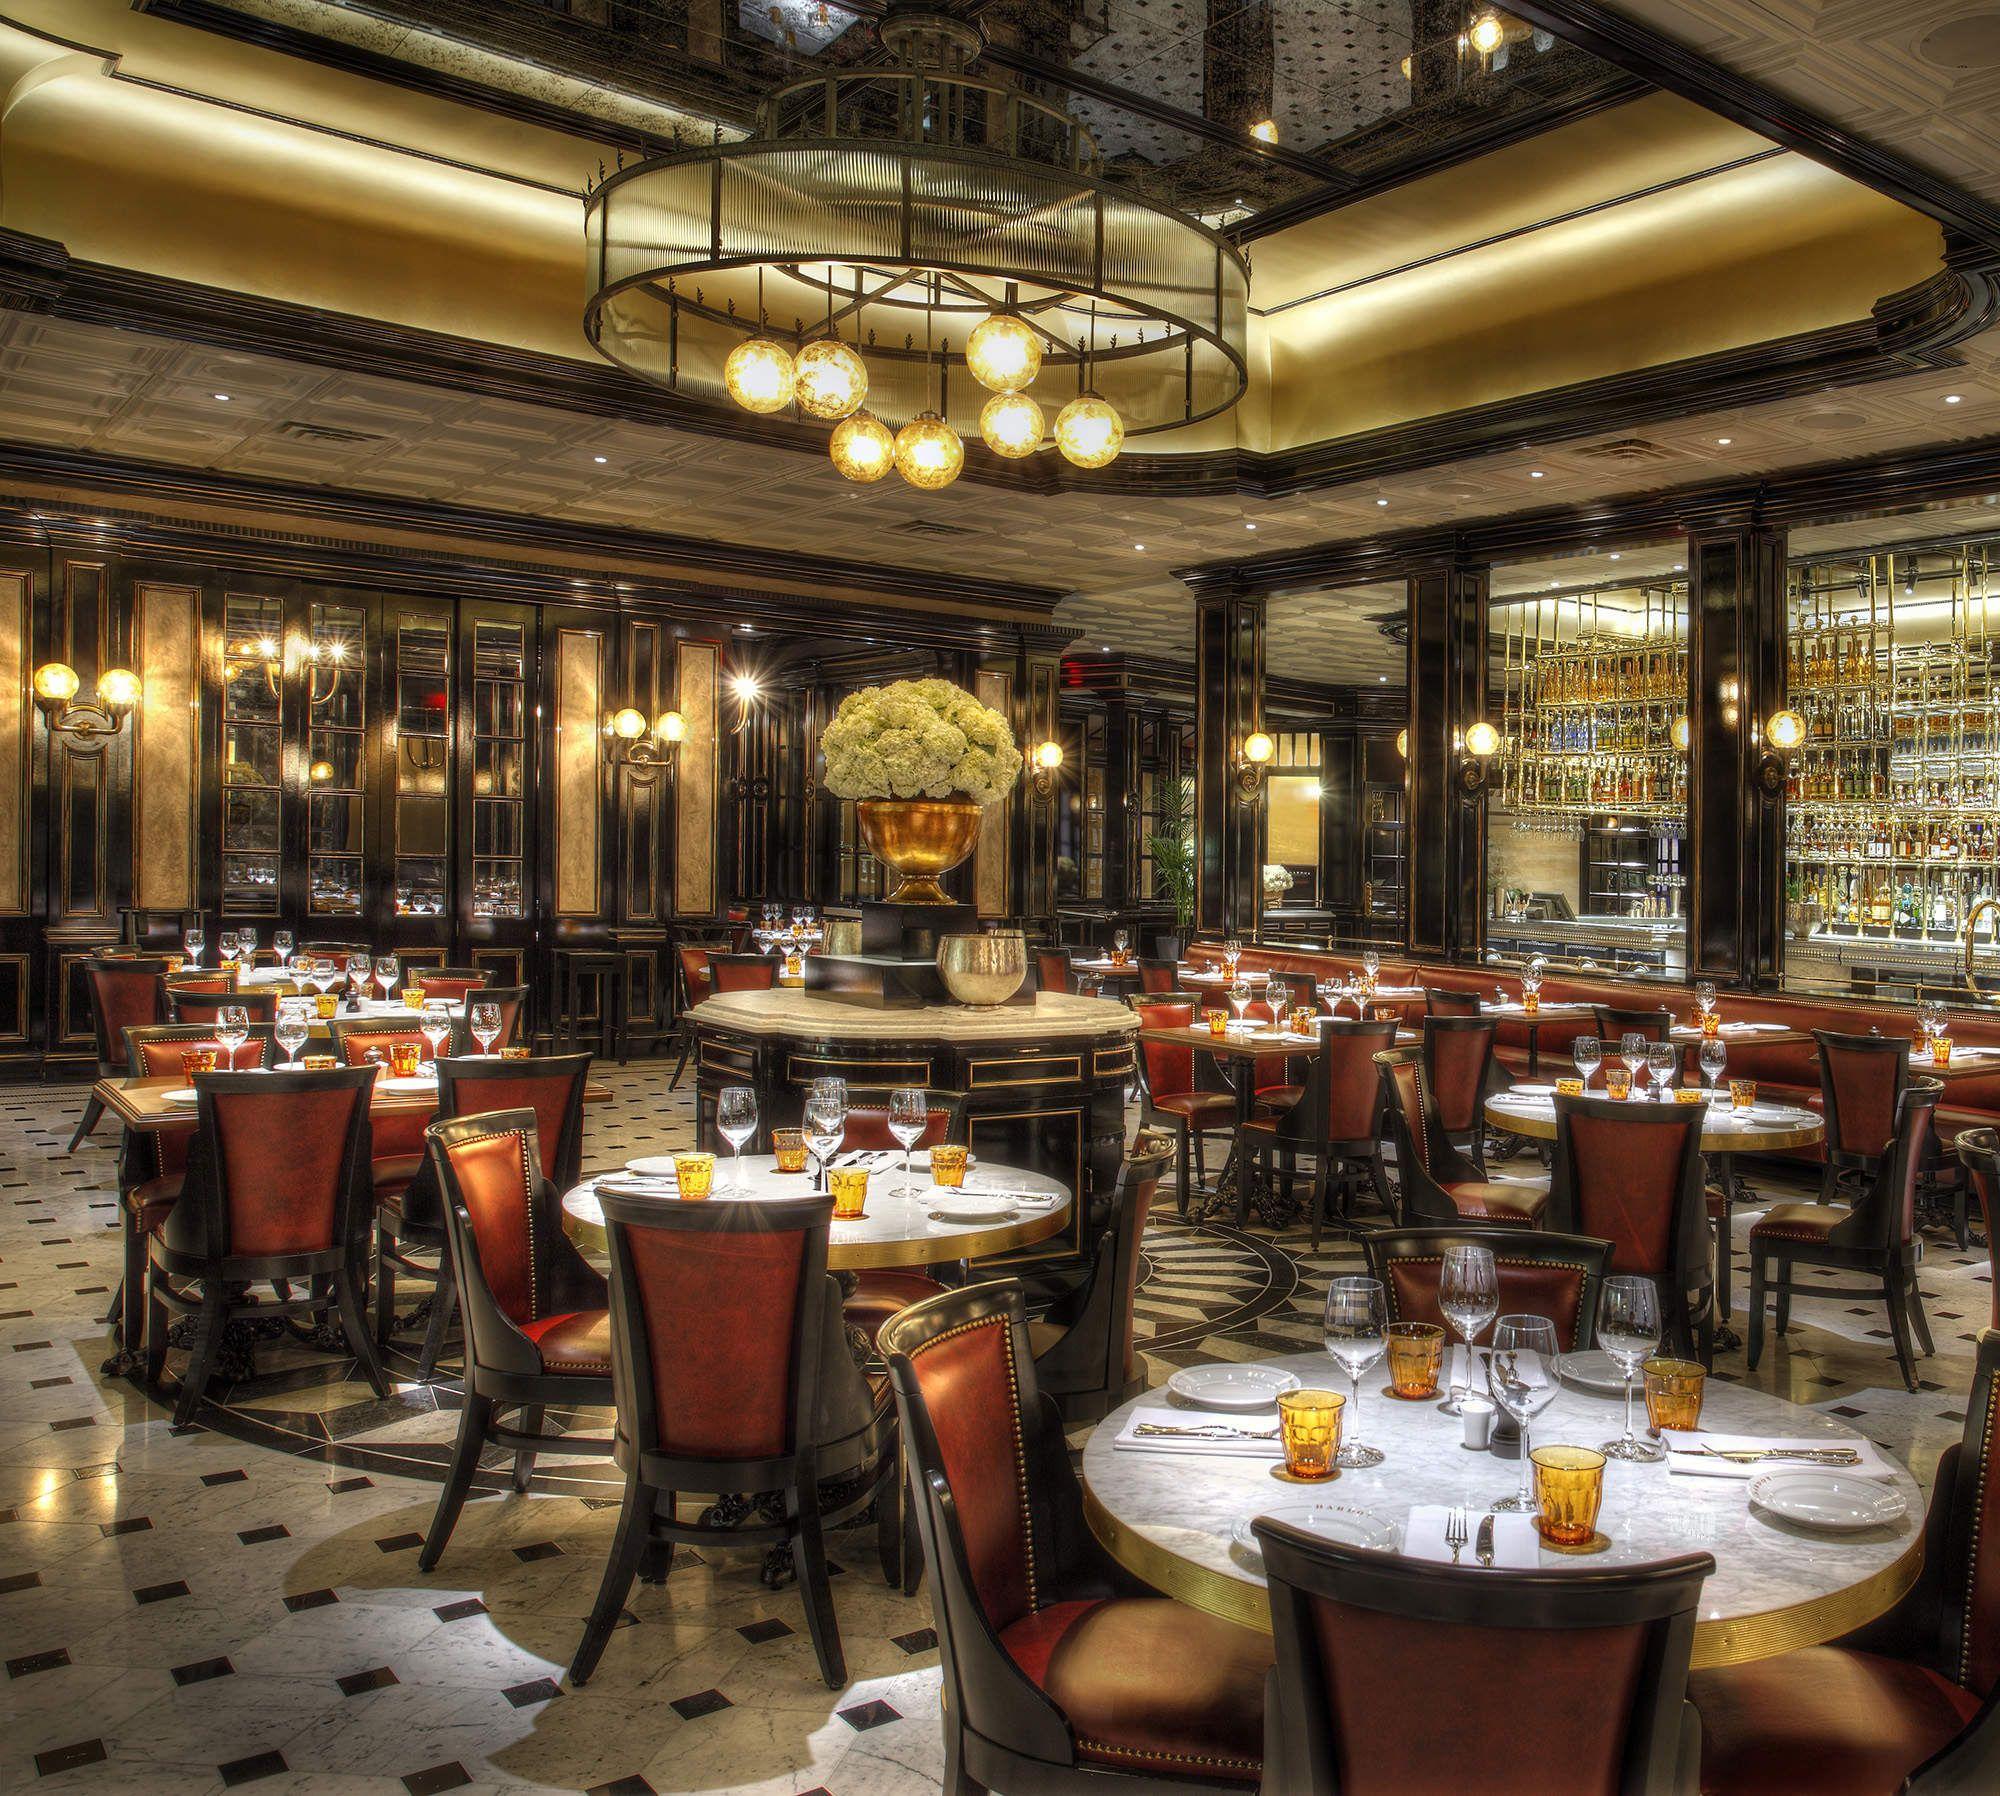 BARDOT Brasserie at ARIA... Thrillist's 11 Most Exciting New Restaurants on the Las Vegas Strip